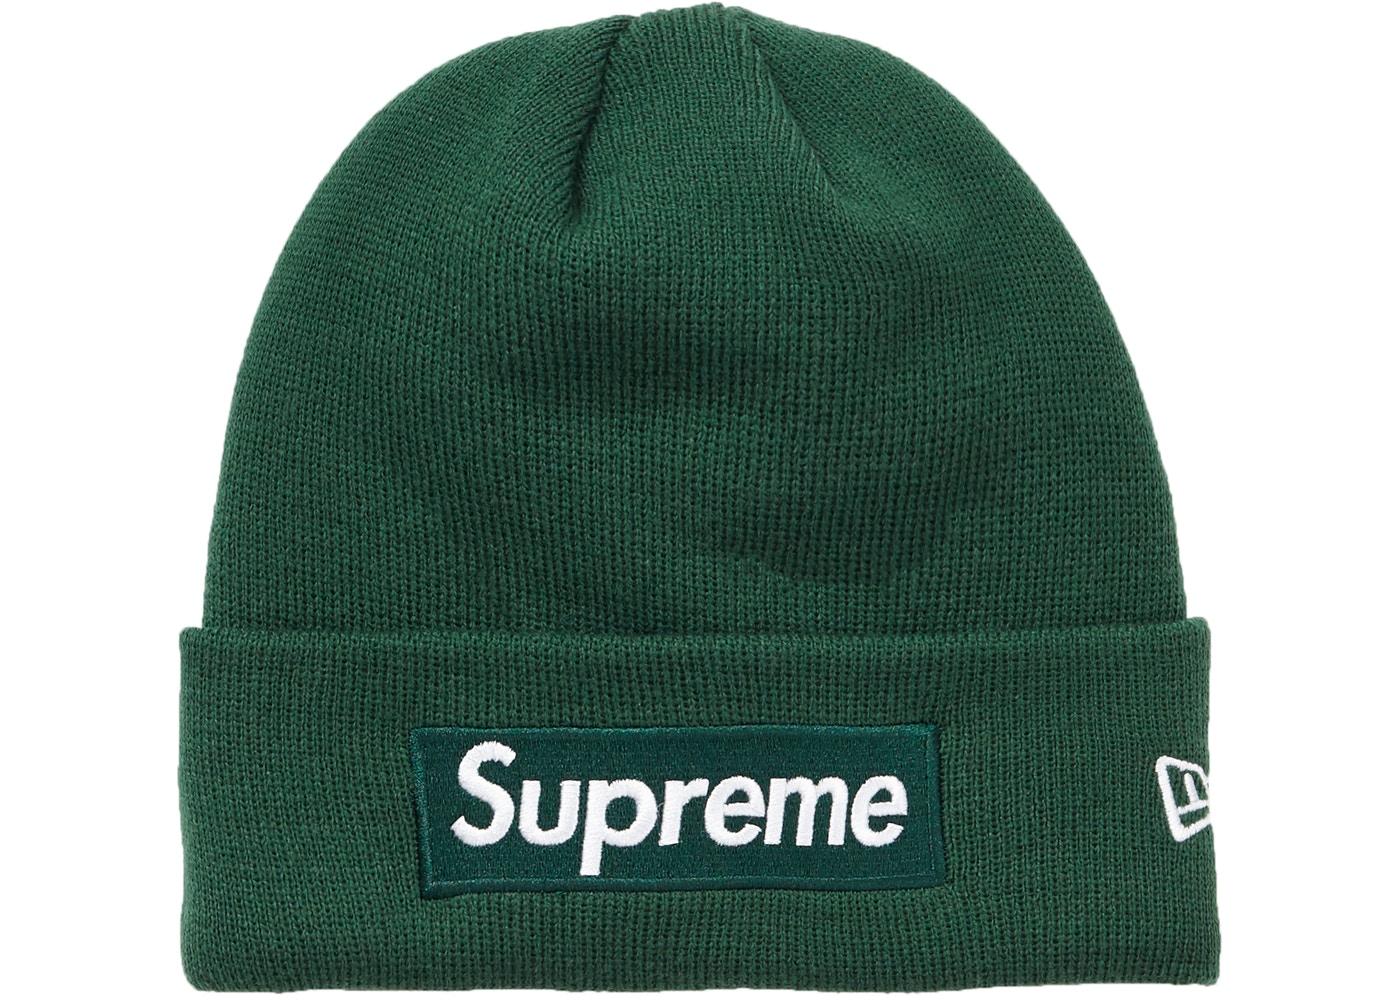 750df87aaf3 Supreme New Era Box Logo Beanie (FW18) Dark Green - FW18